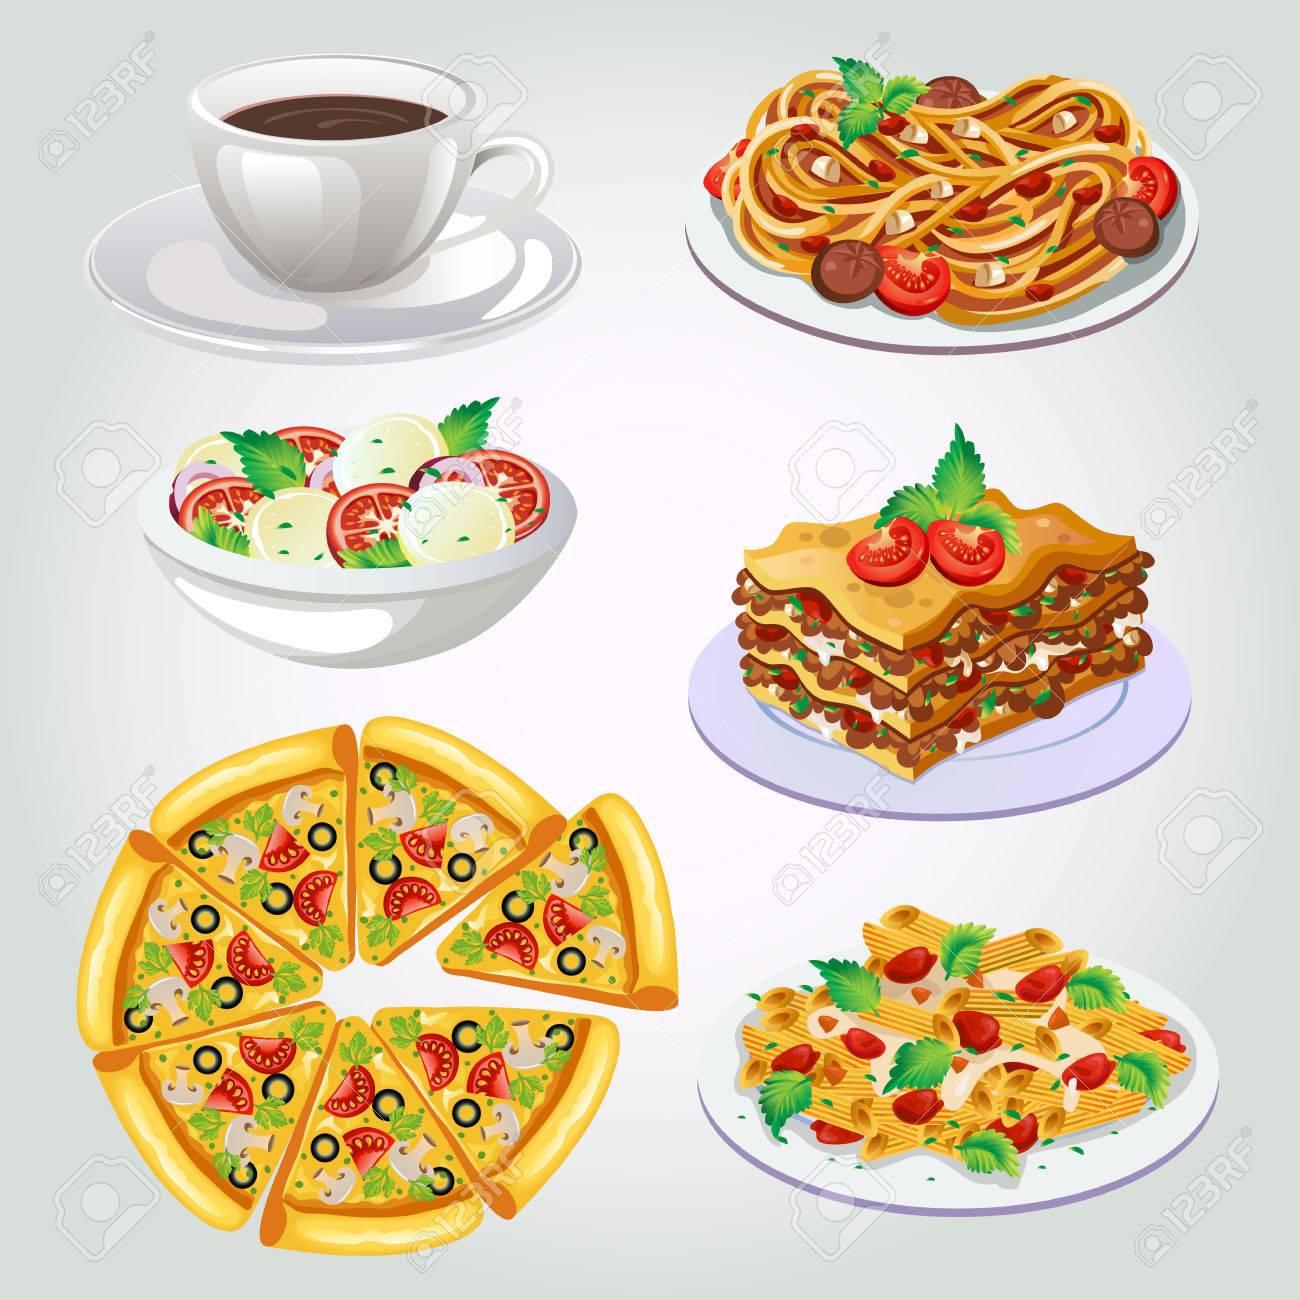 Italian Food Clipart Free Download Clip Art.